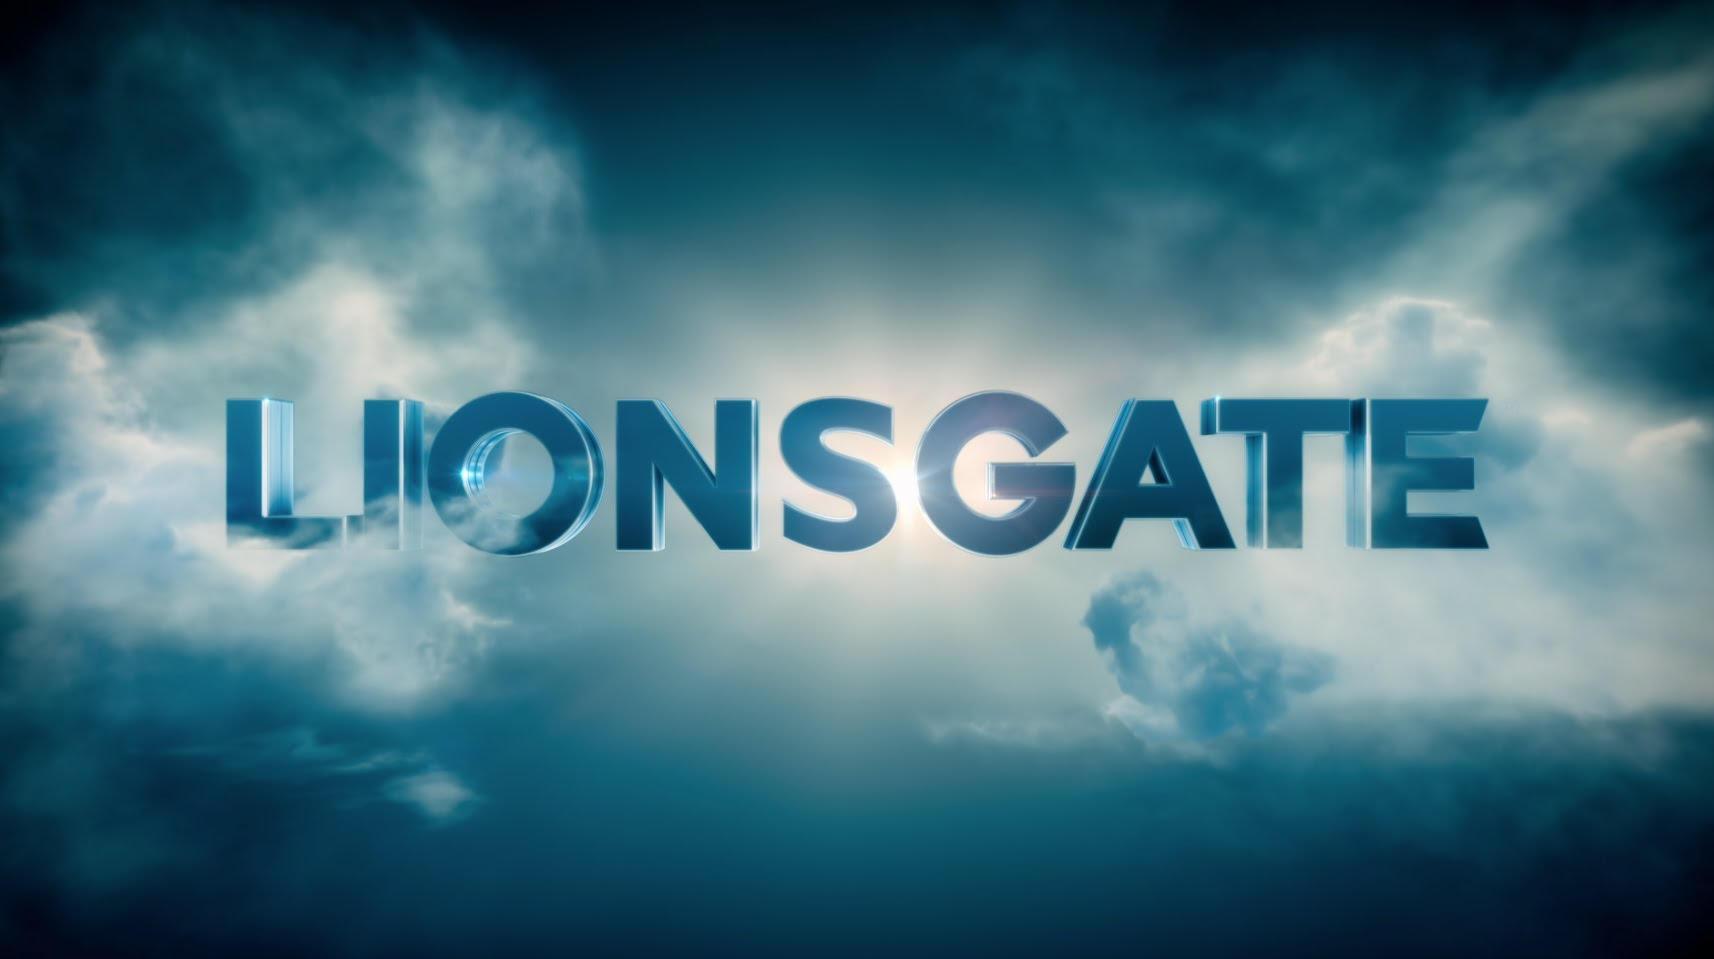 LionsgateLogo